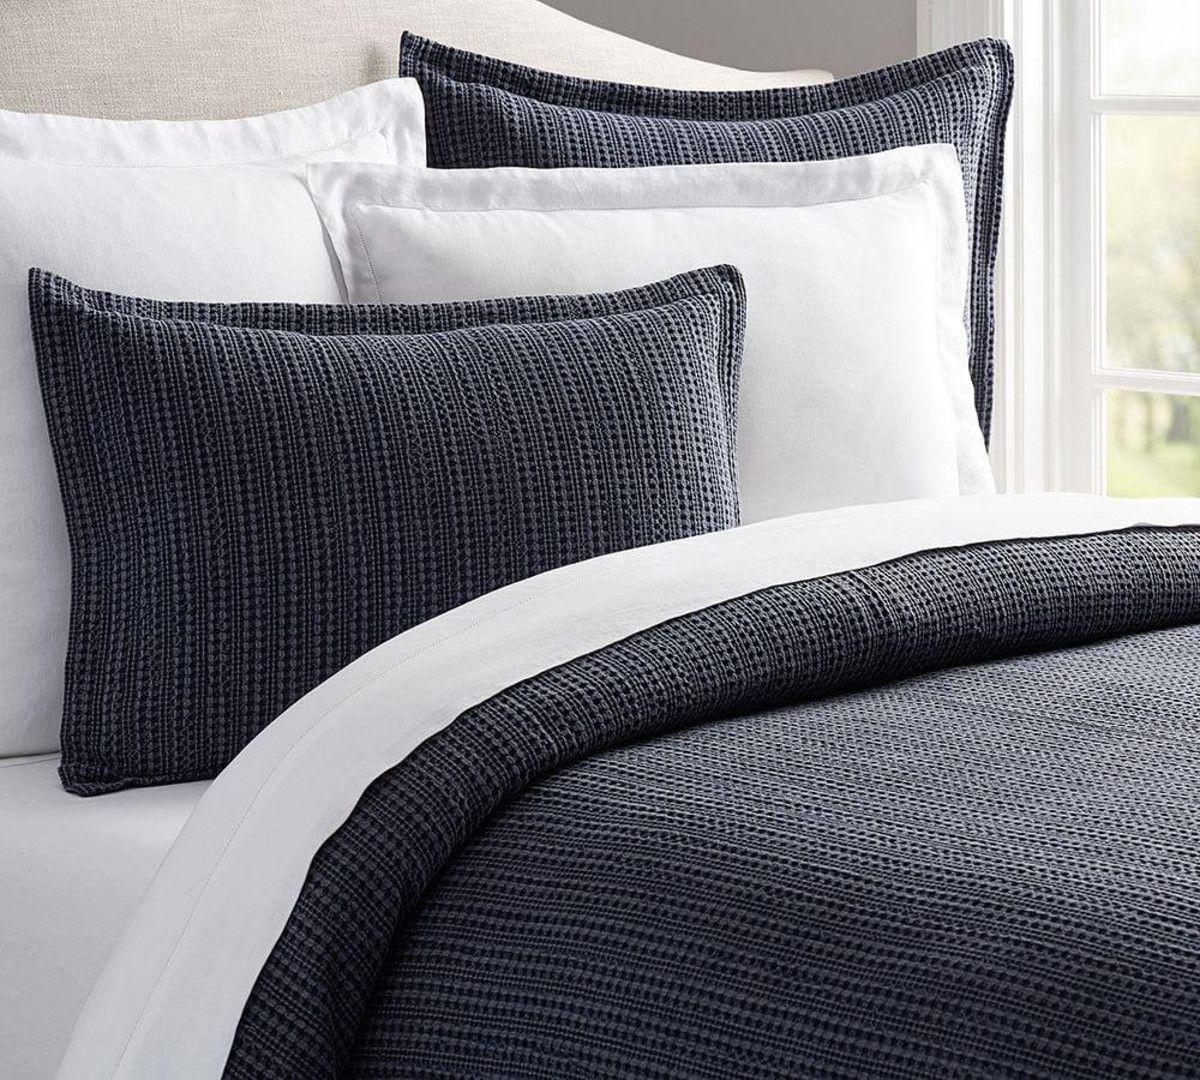 Honeycomb quilt cover u pillowcases pottery barn au harvard st